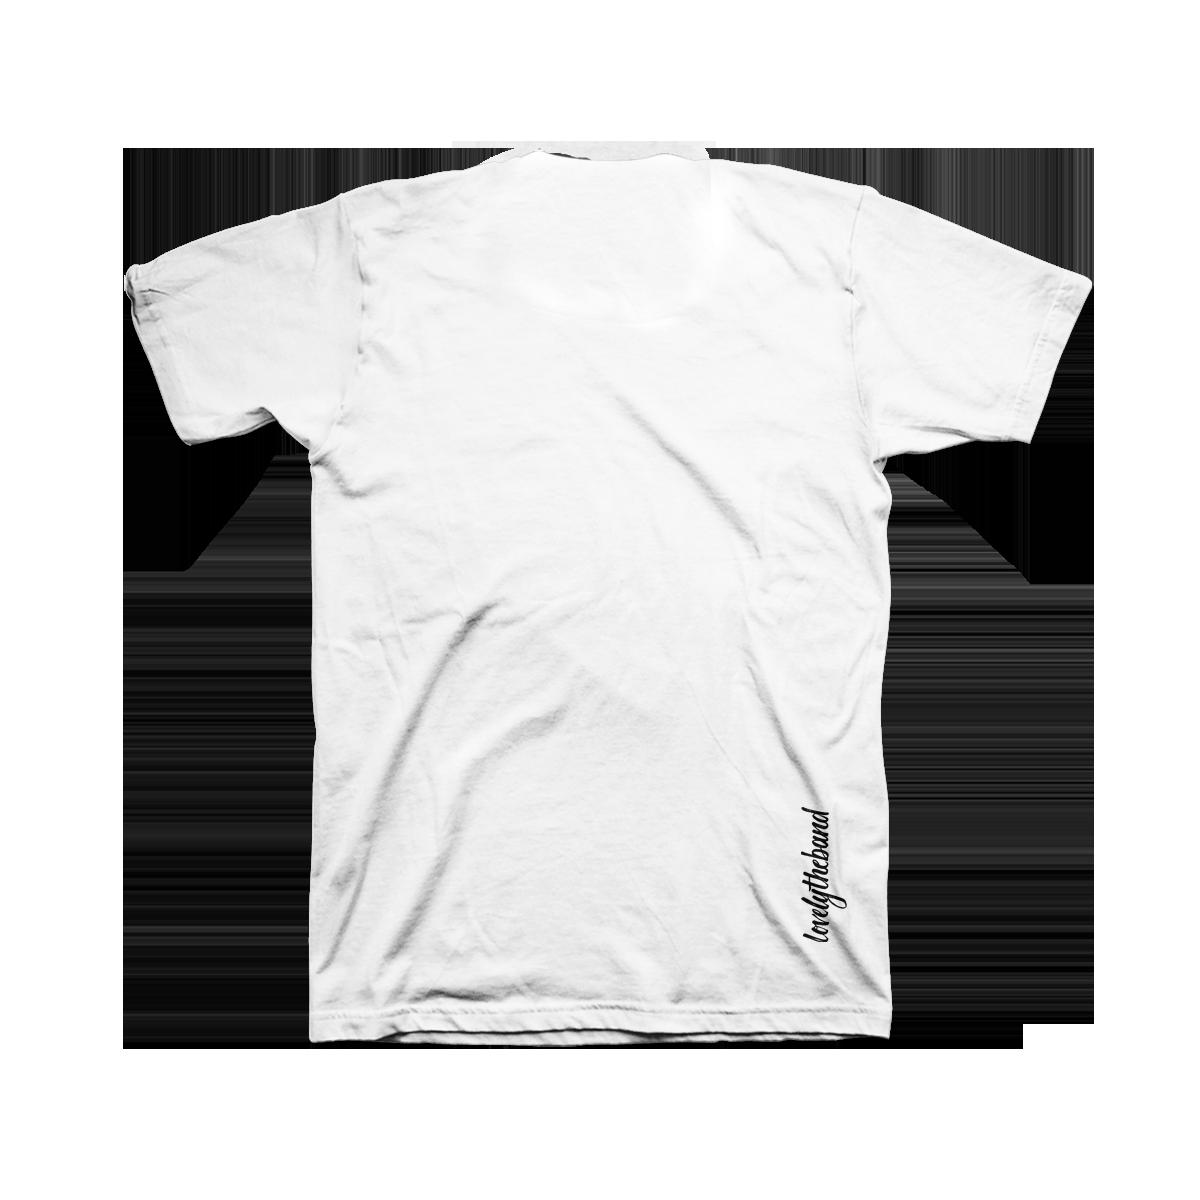 lovelytheband black and white photo t-shirt